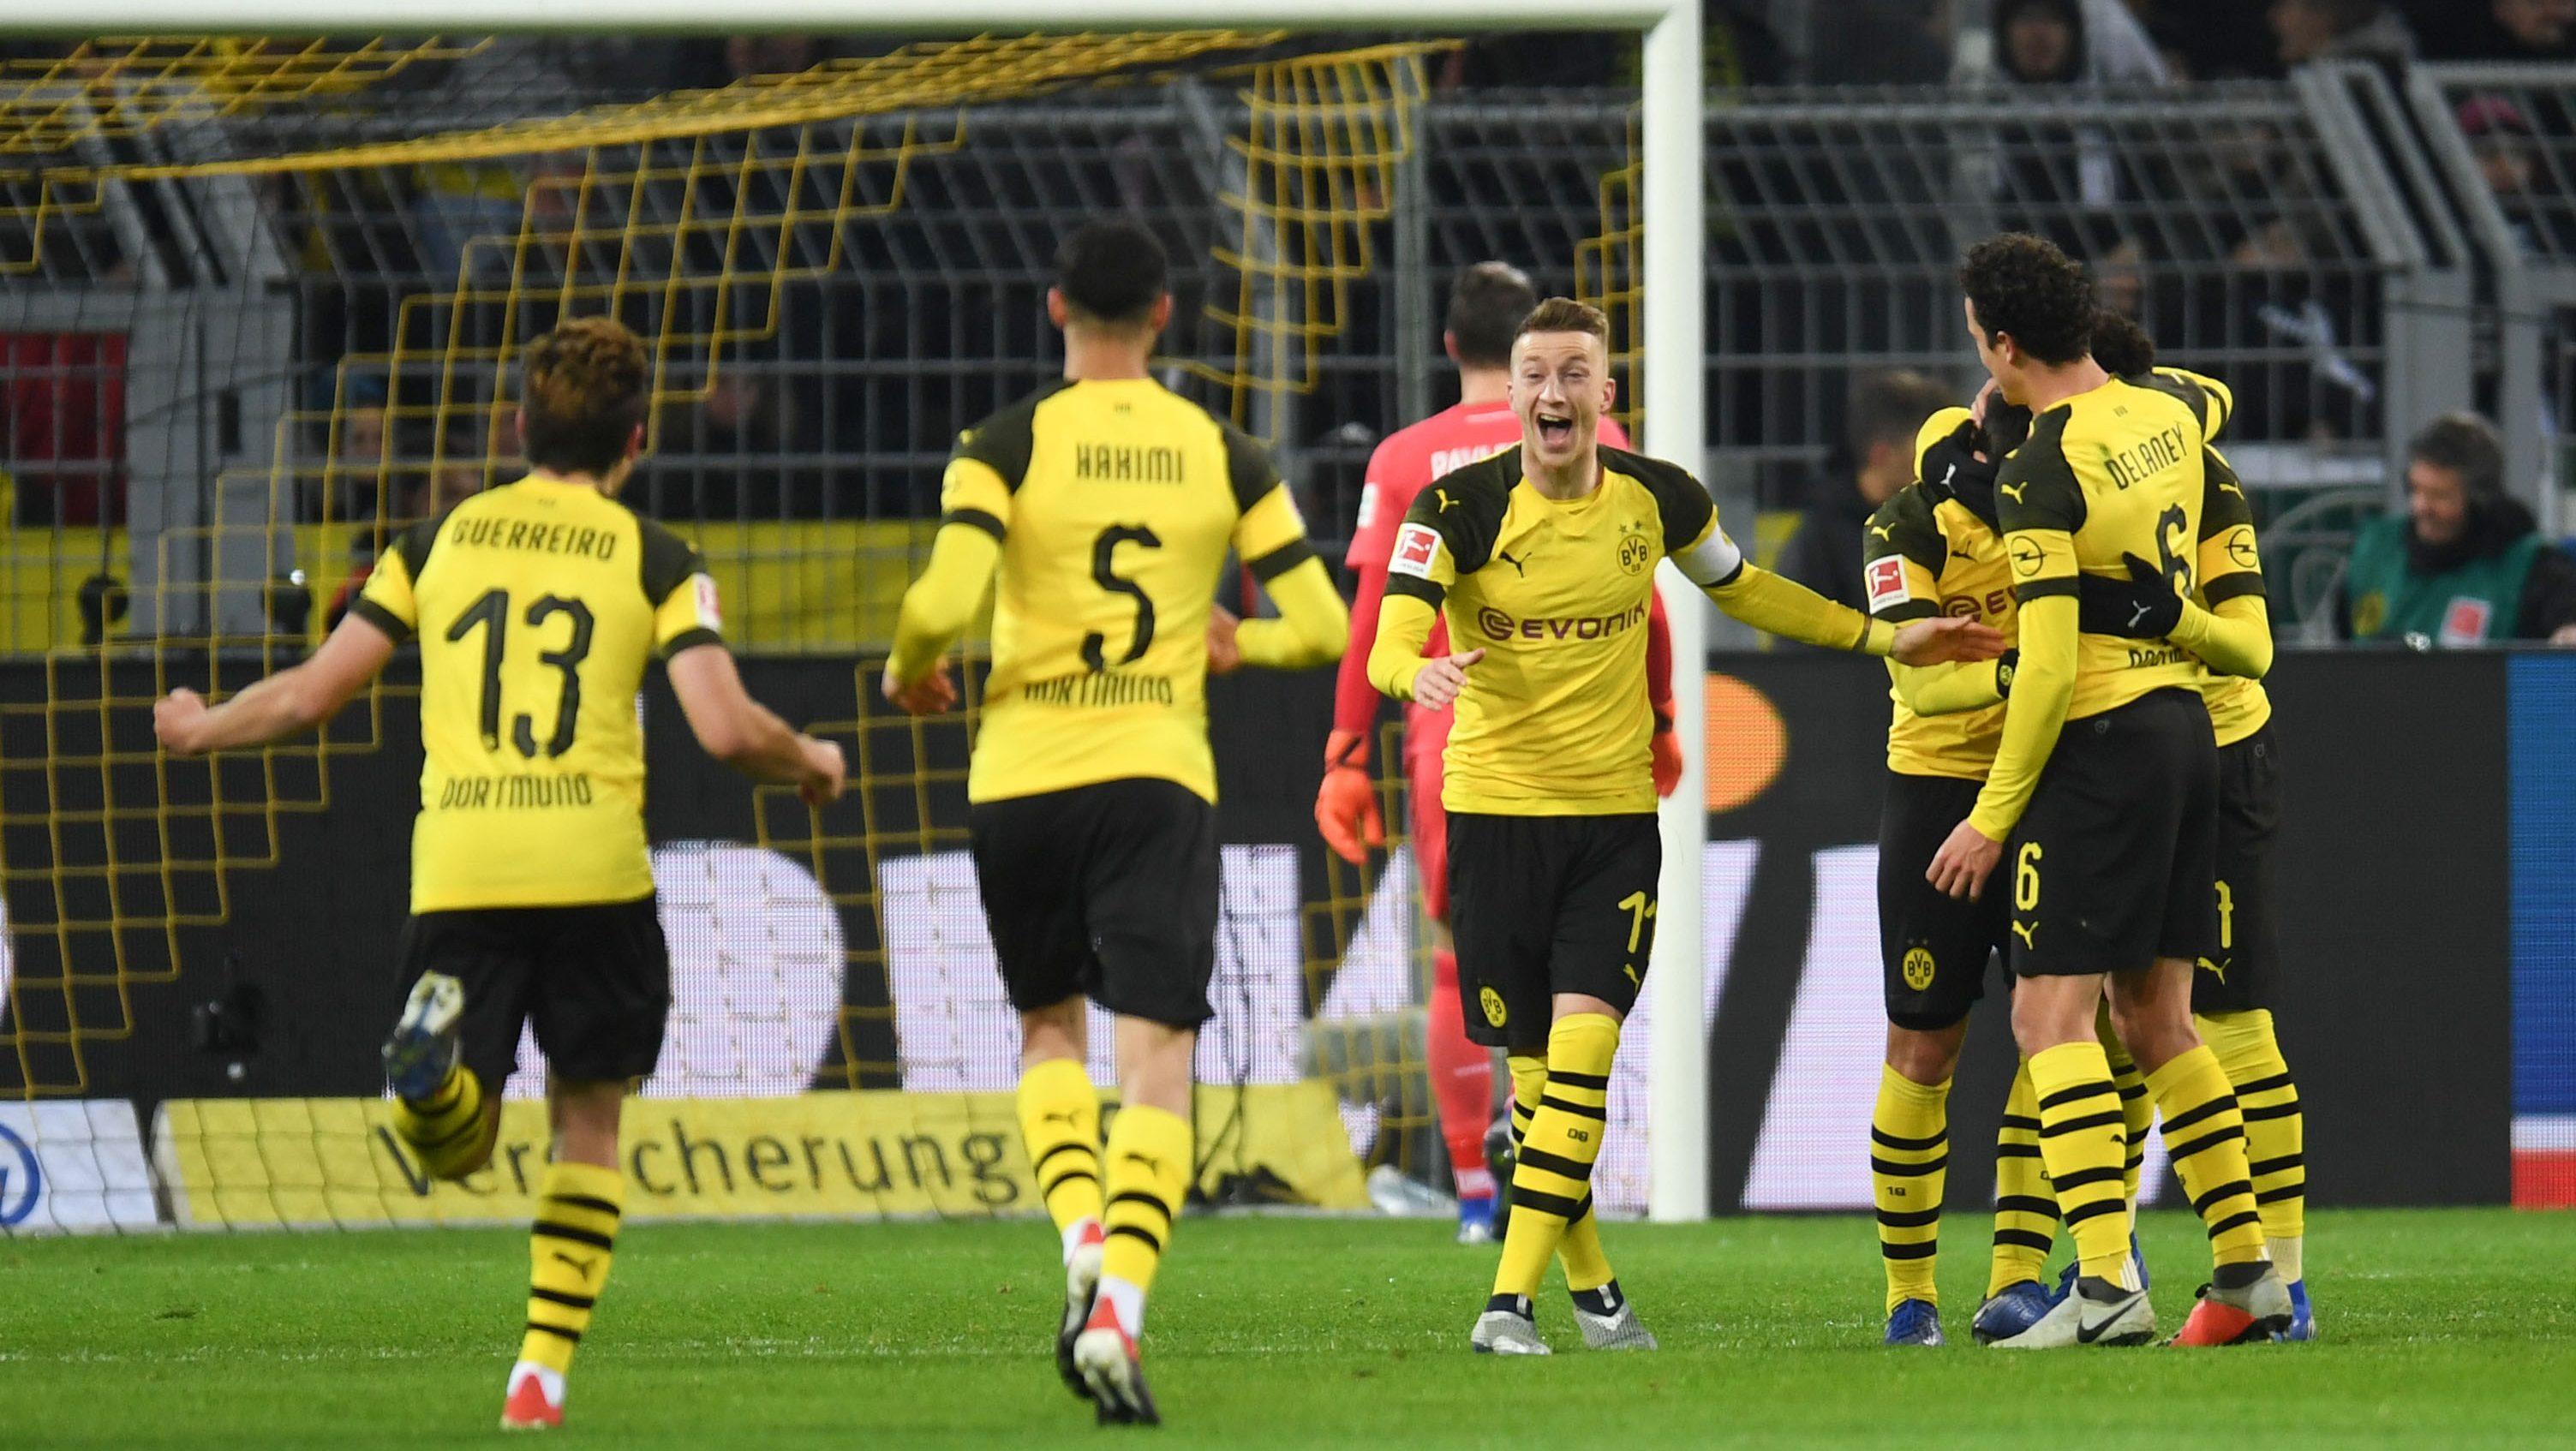 Alcacer and Reus on target as Dortmund down Bremen